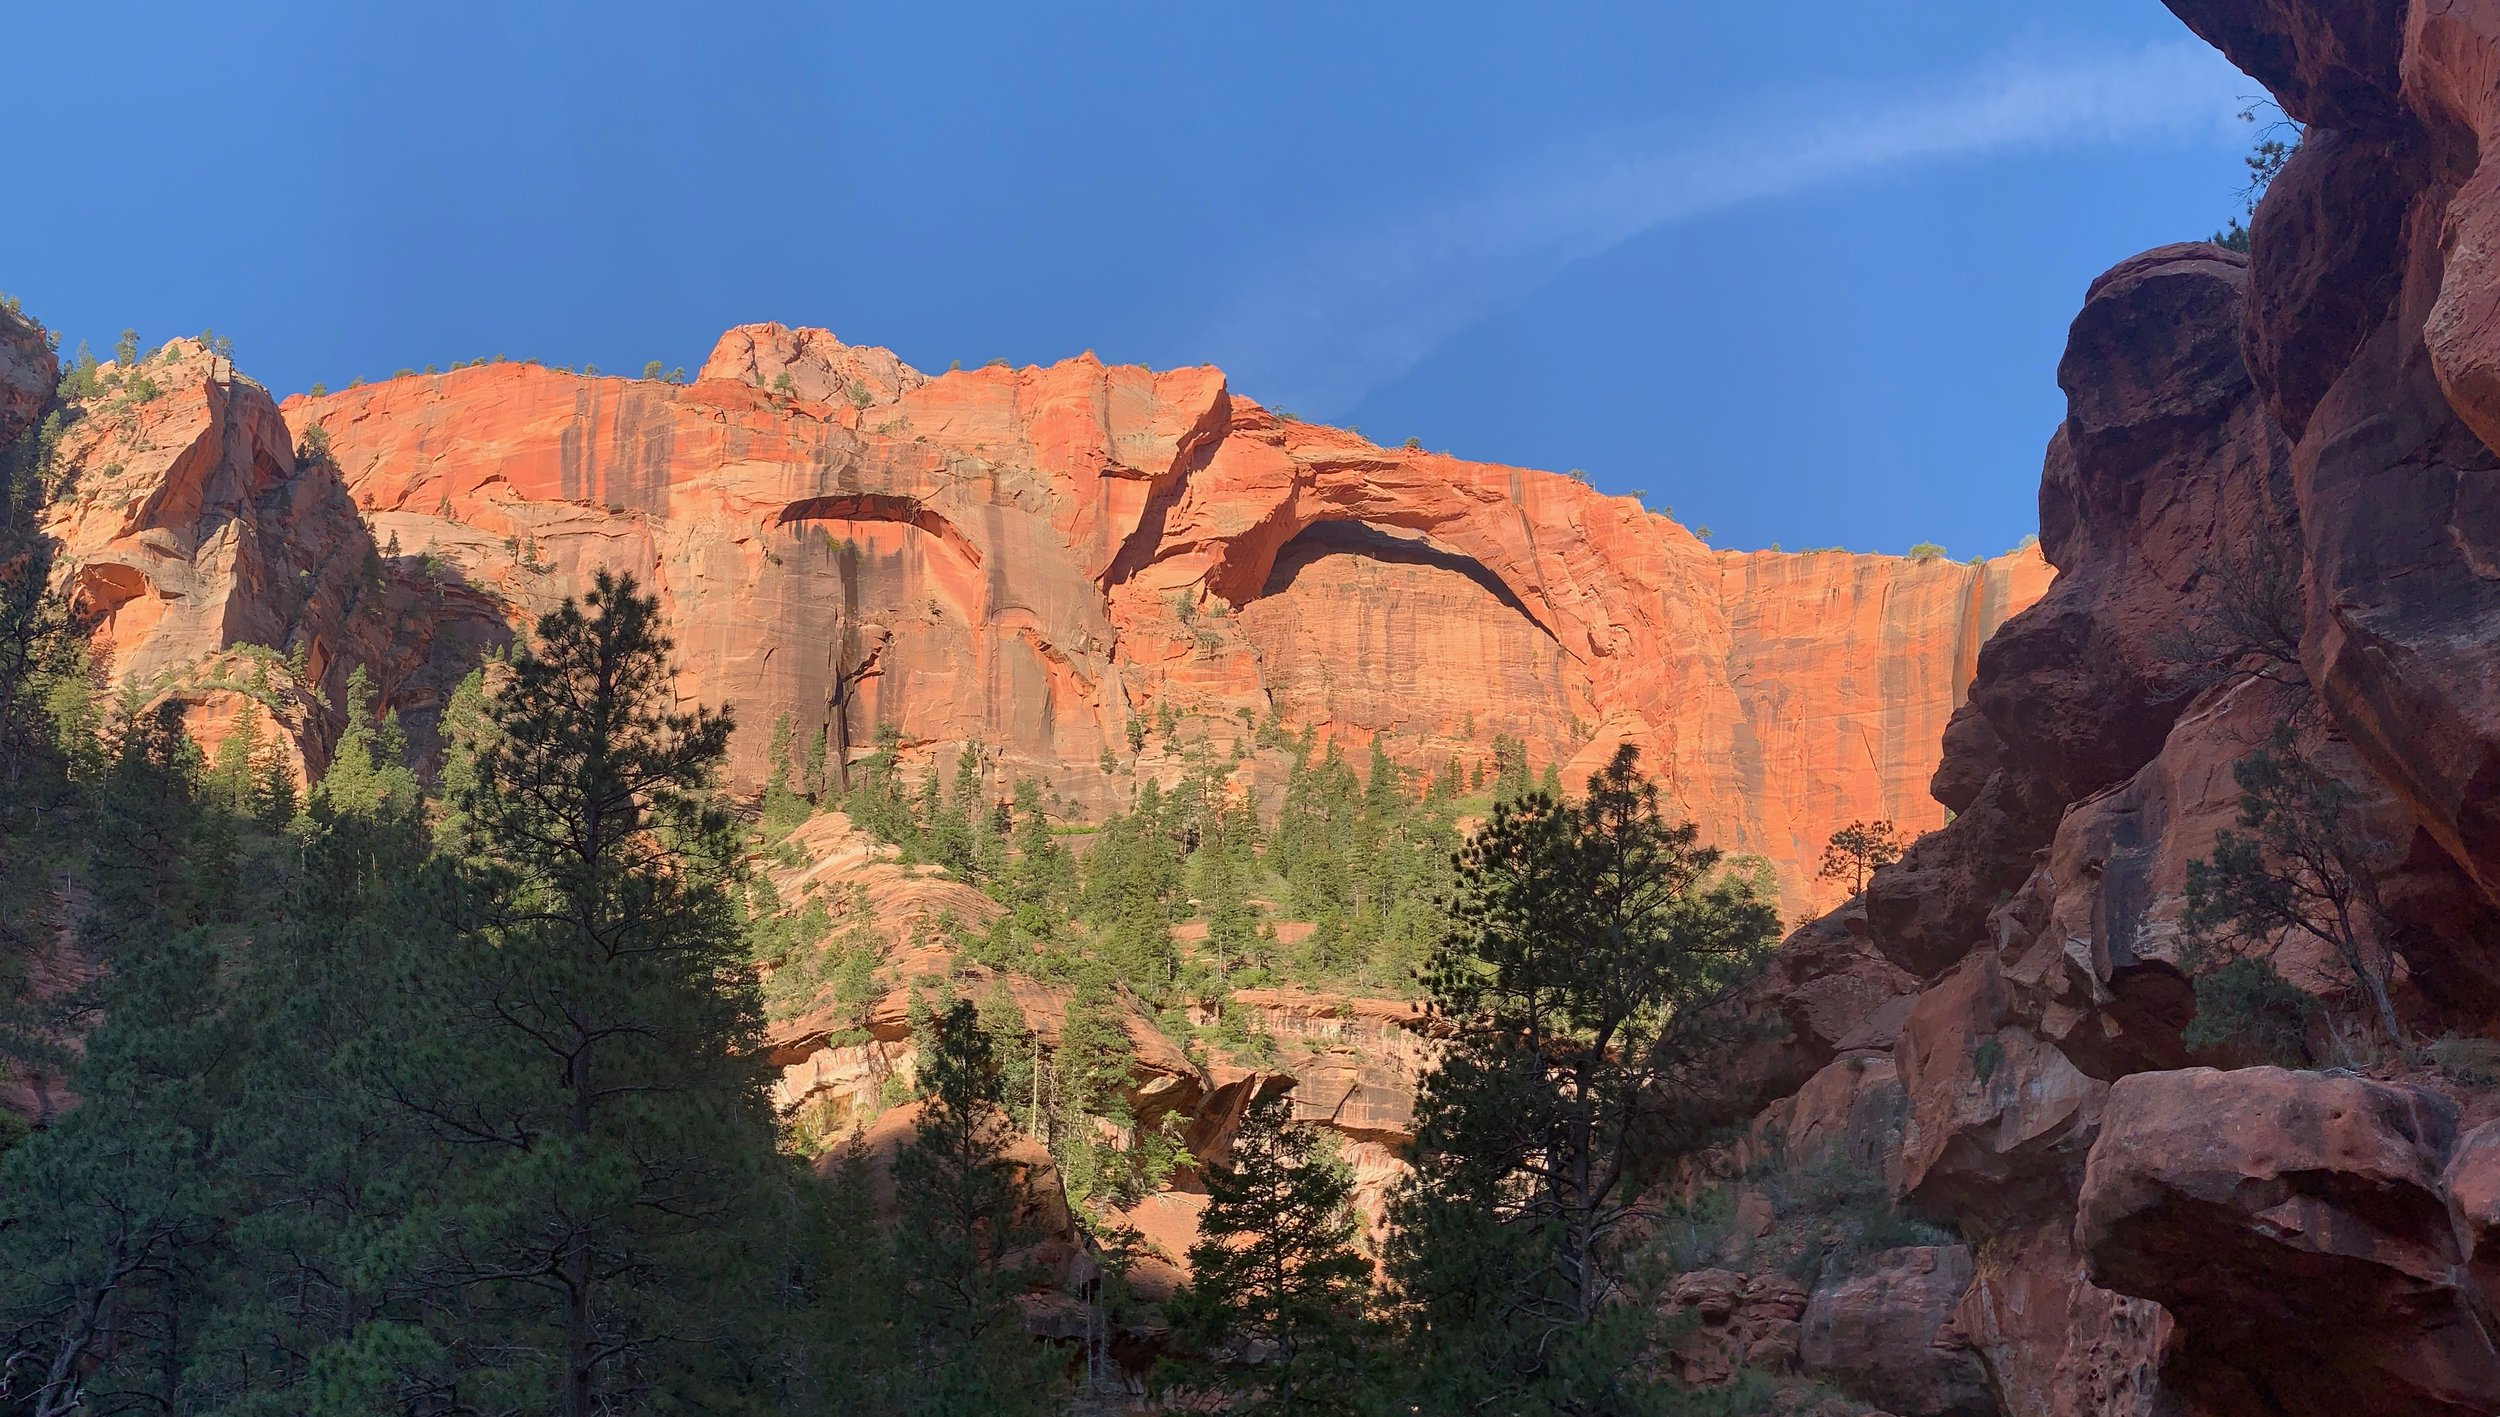 The Kolob Arch